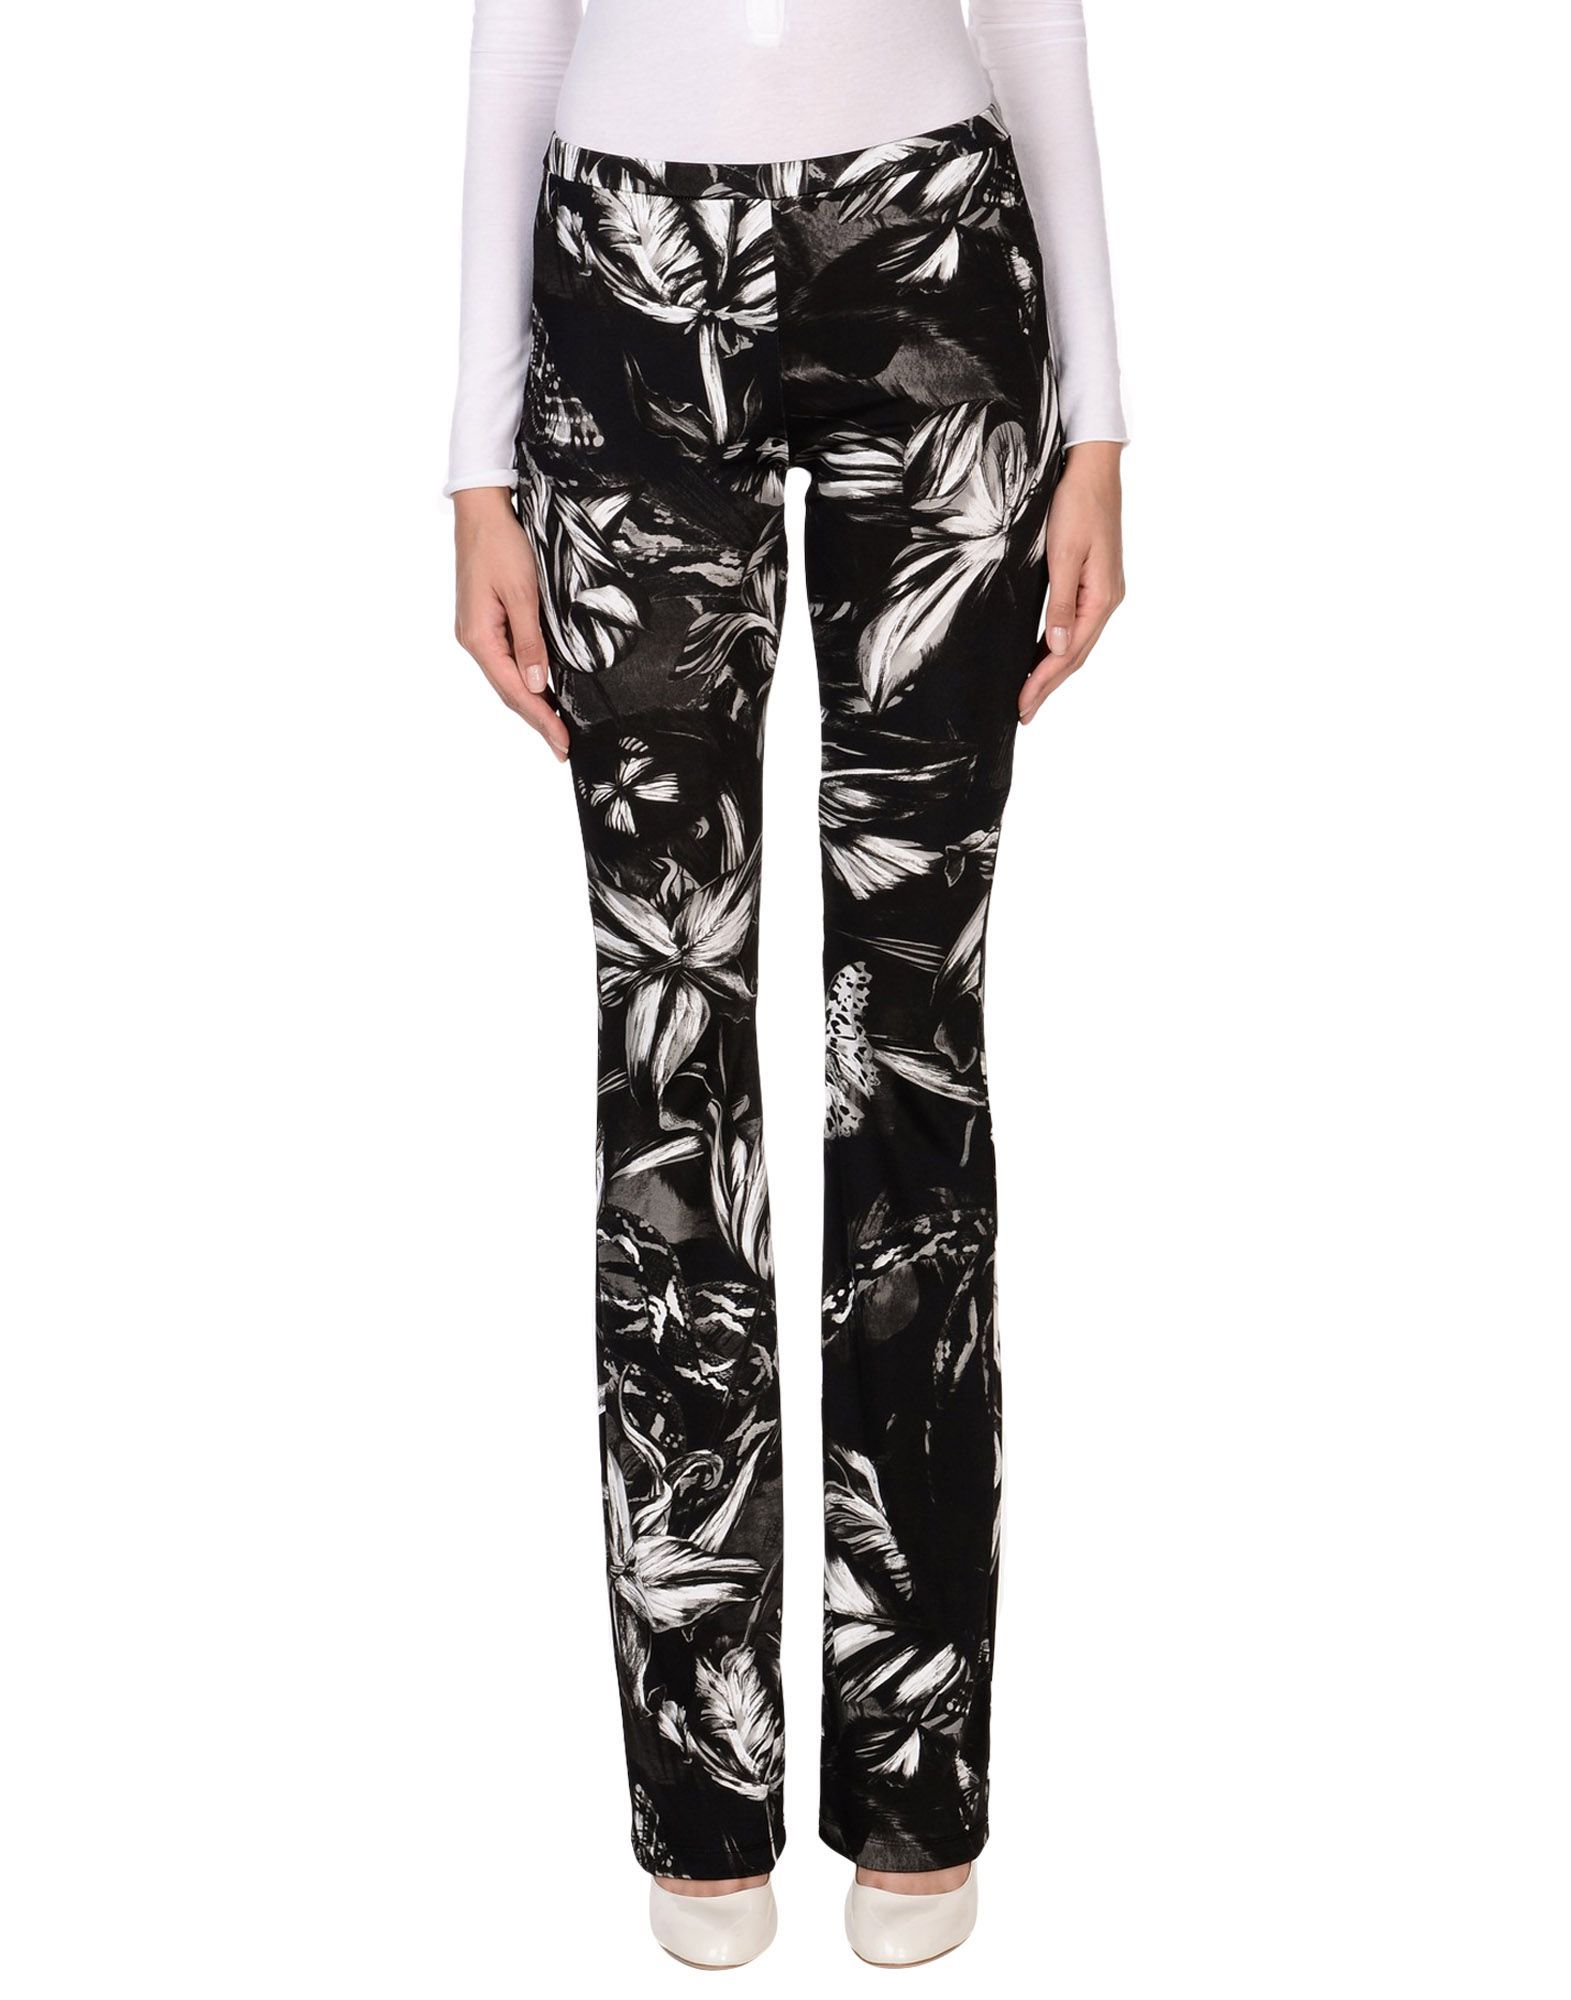 Just Cavalli Black Print Trousers